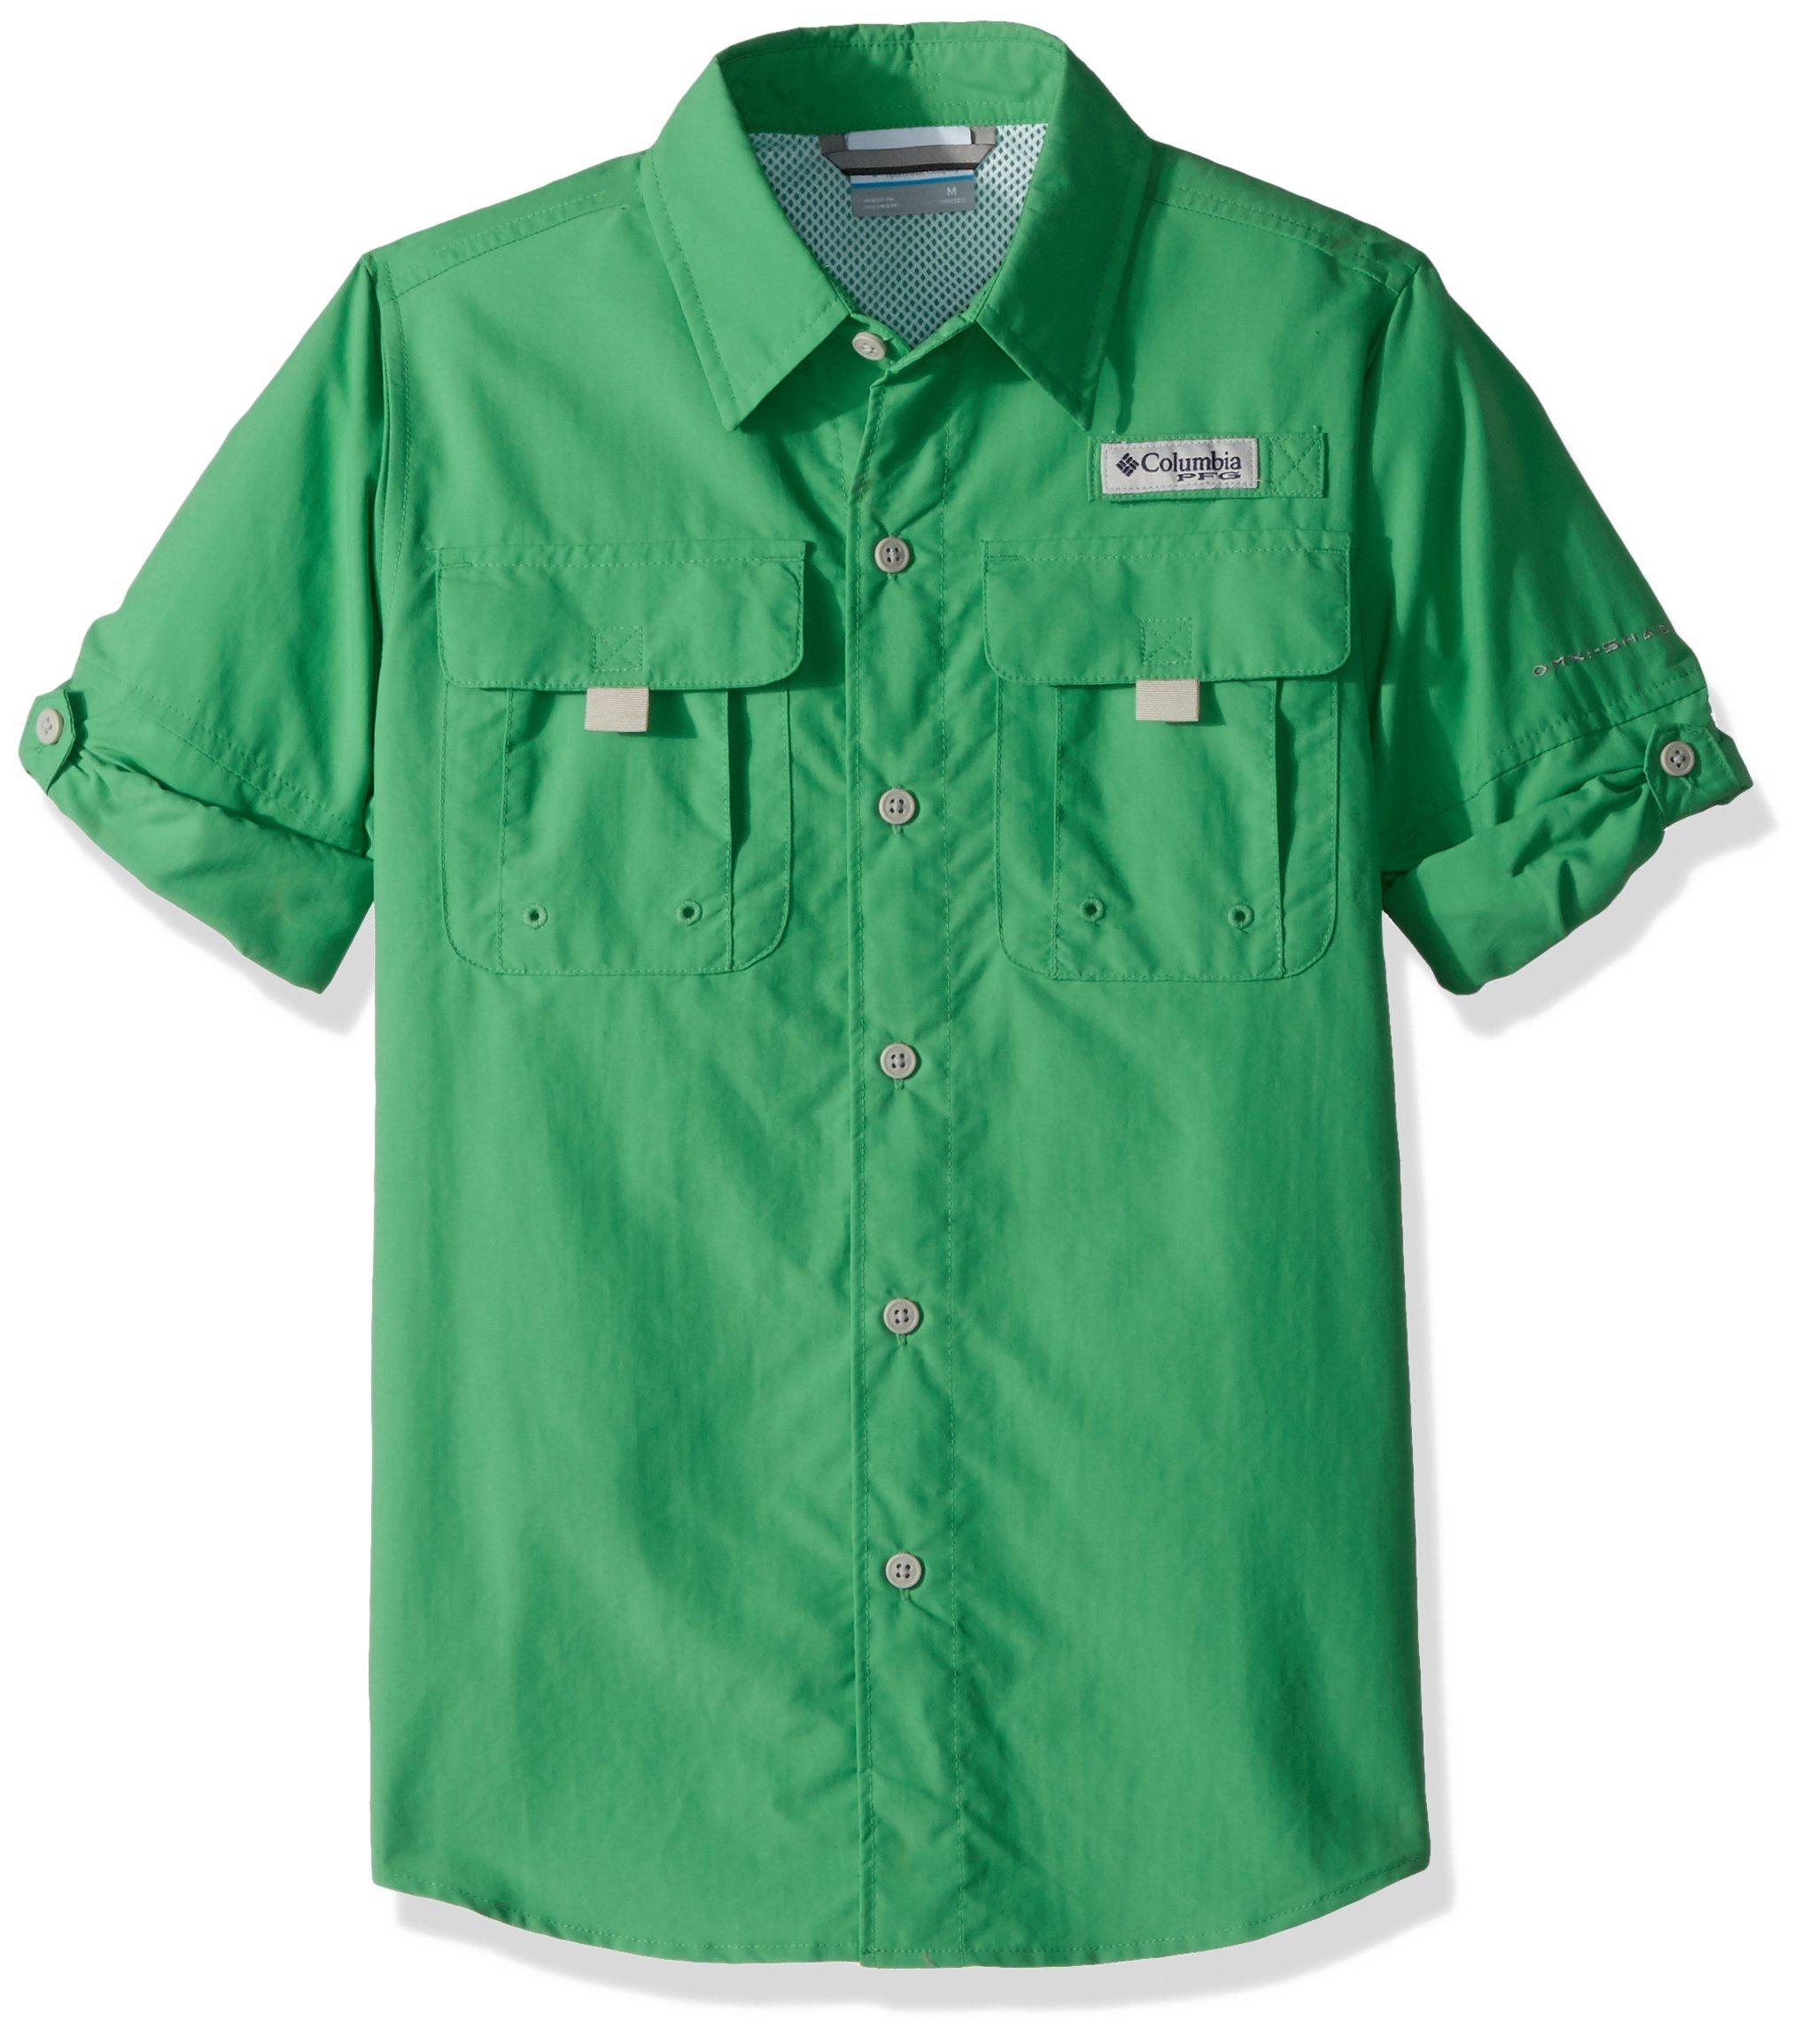 Columbia Boys Bahama Long Sleeve Shirt, Emerald City, Large